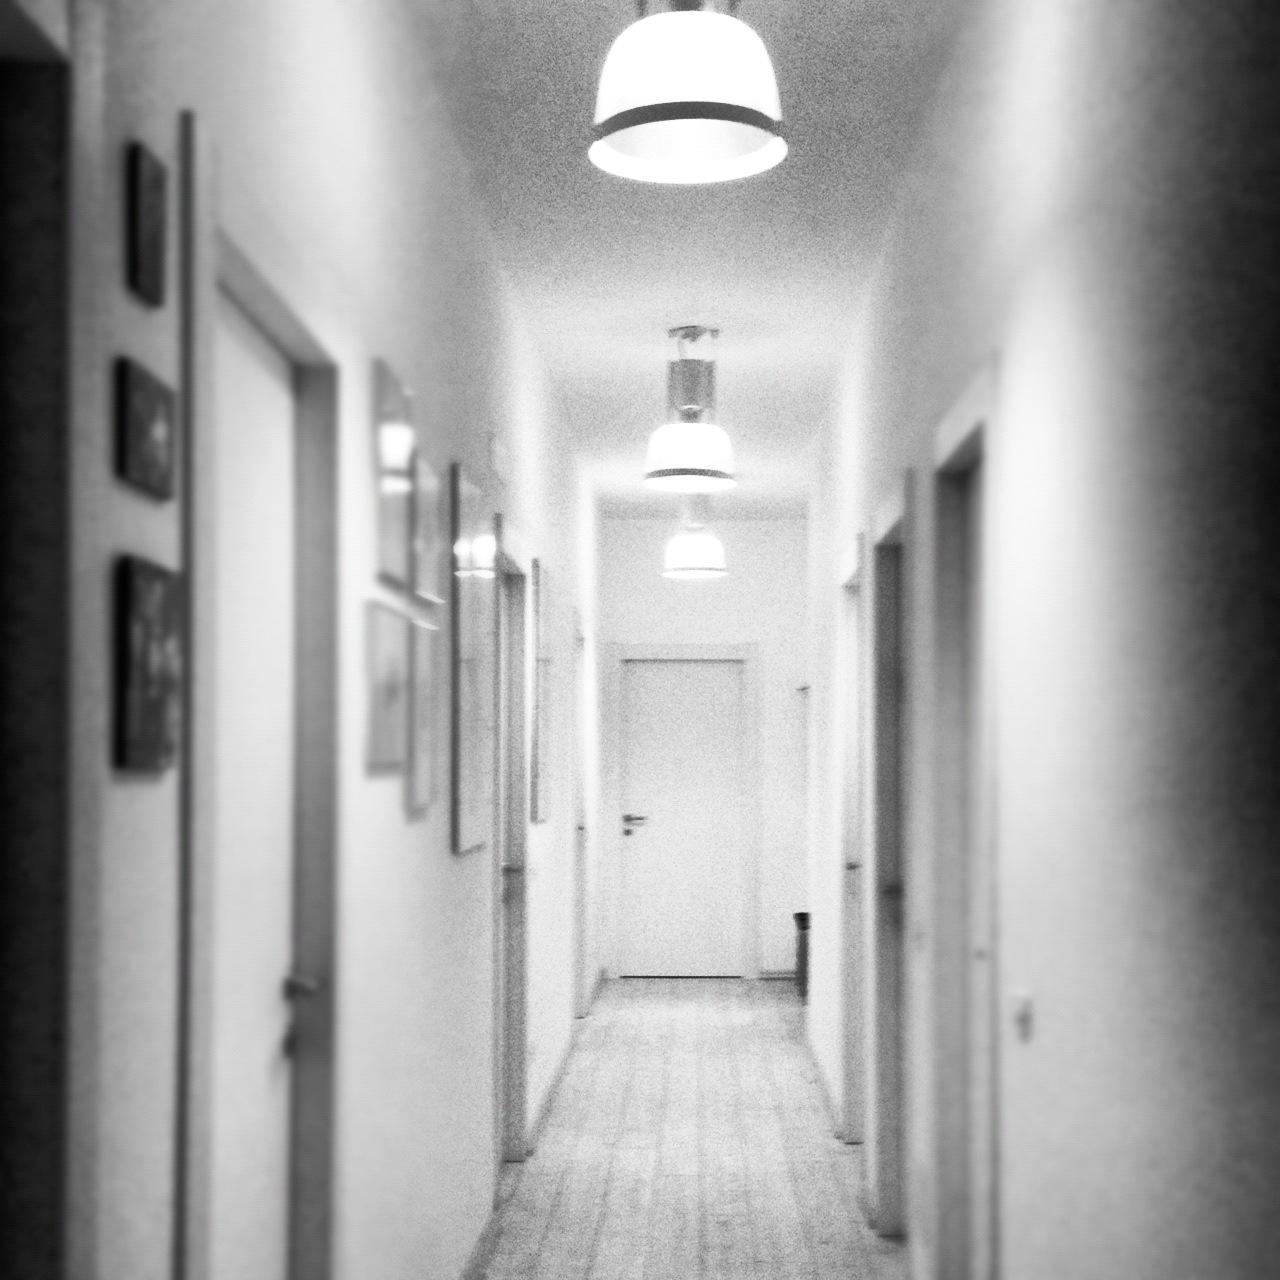 emptyhallway.jpg